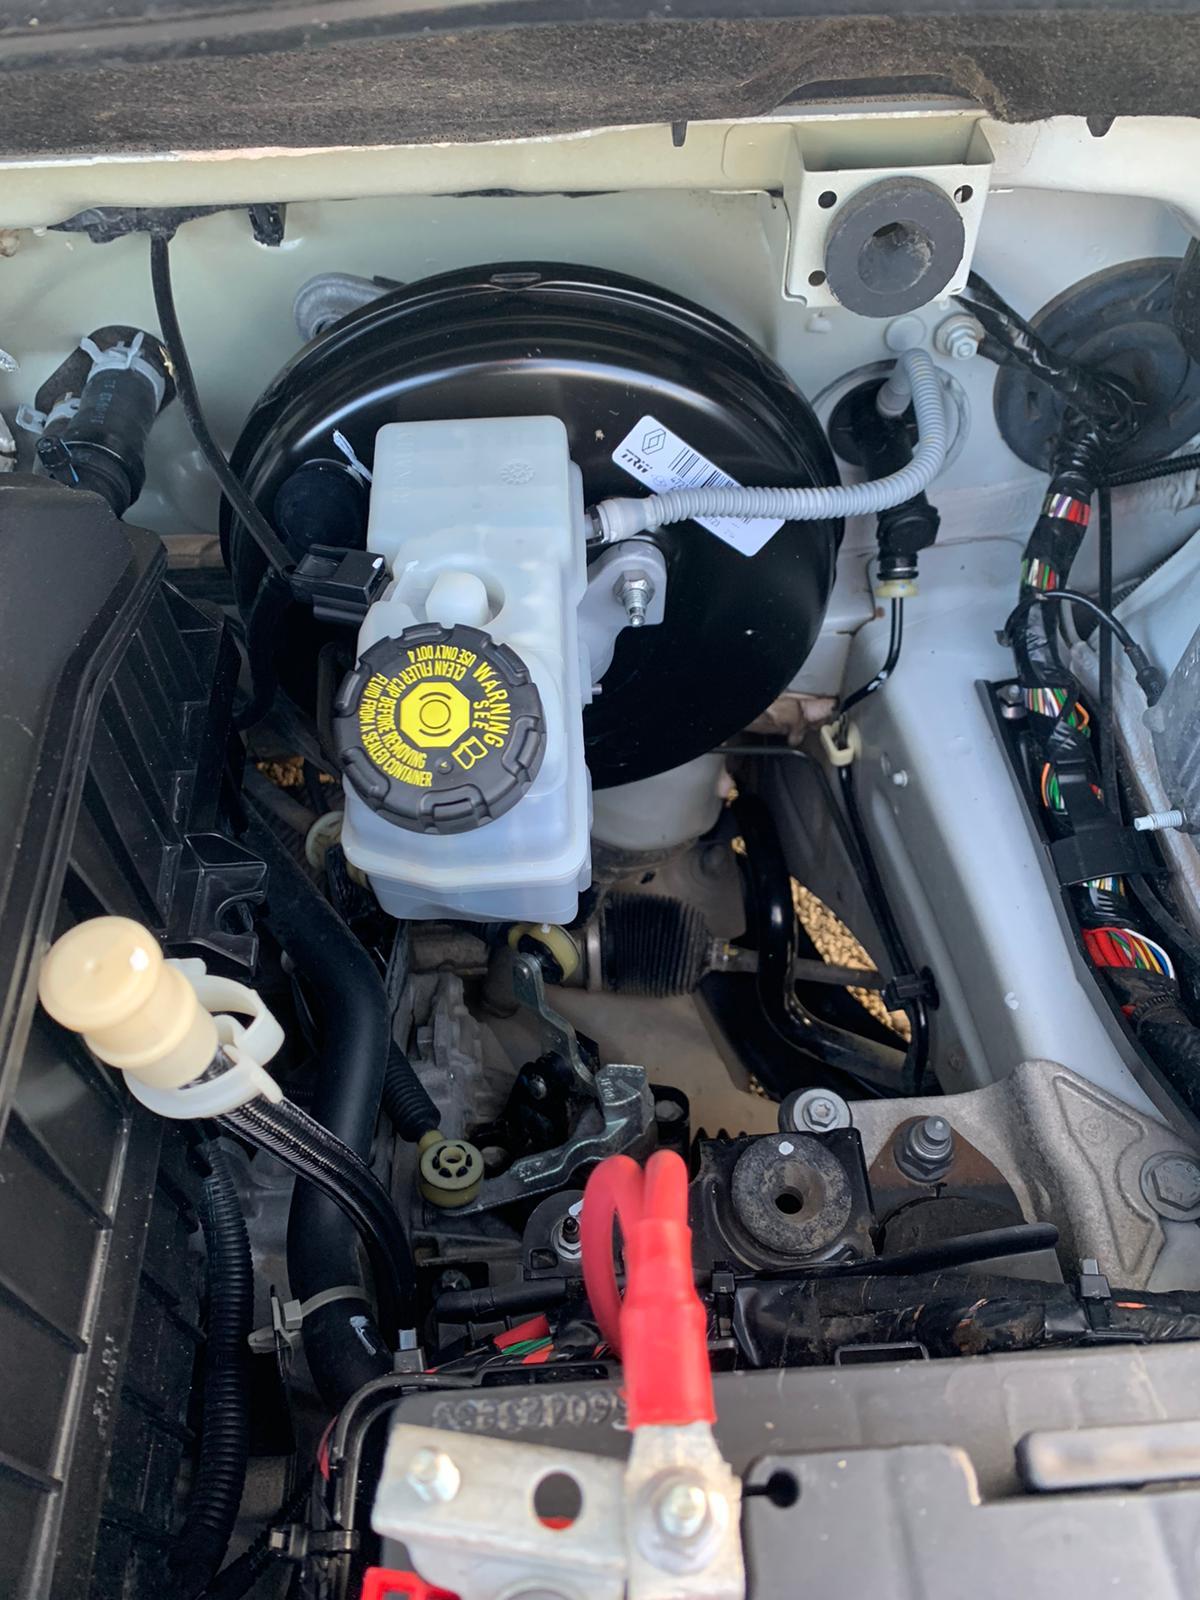 Renault Clio 1.2 75 CV